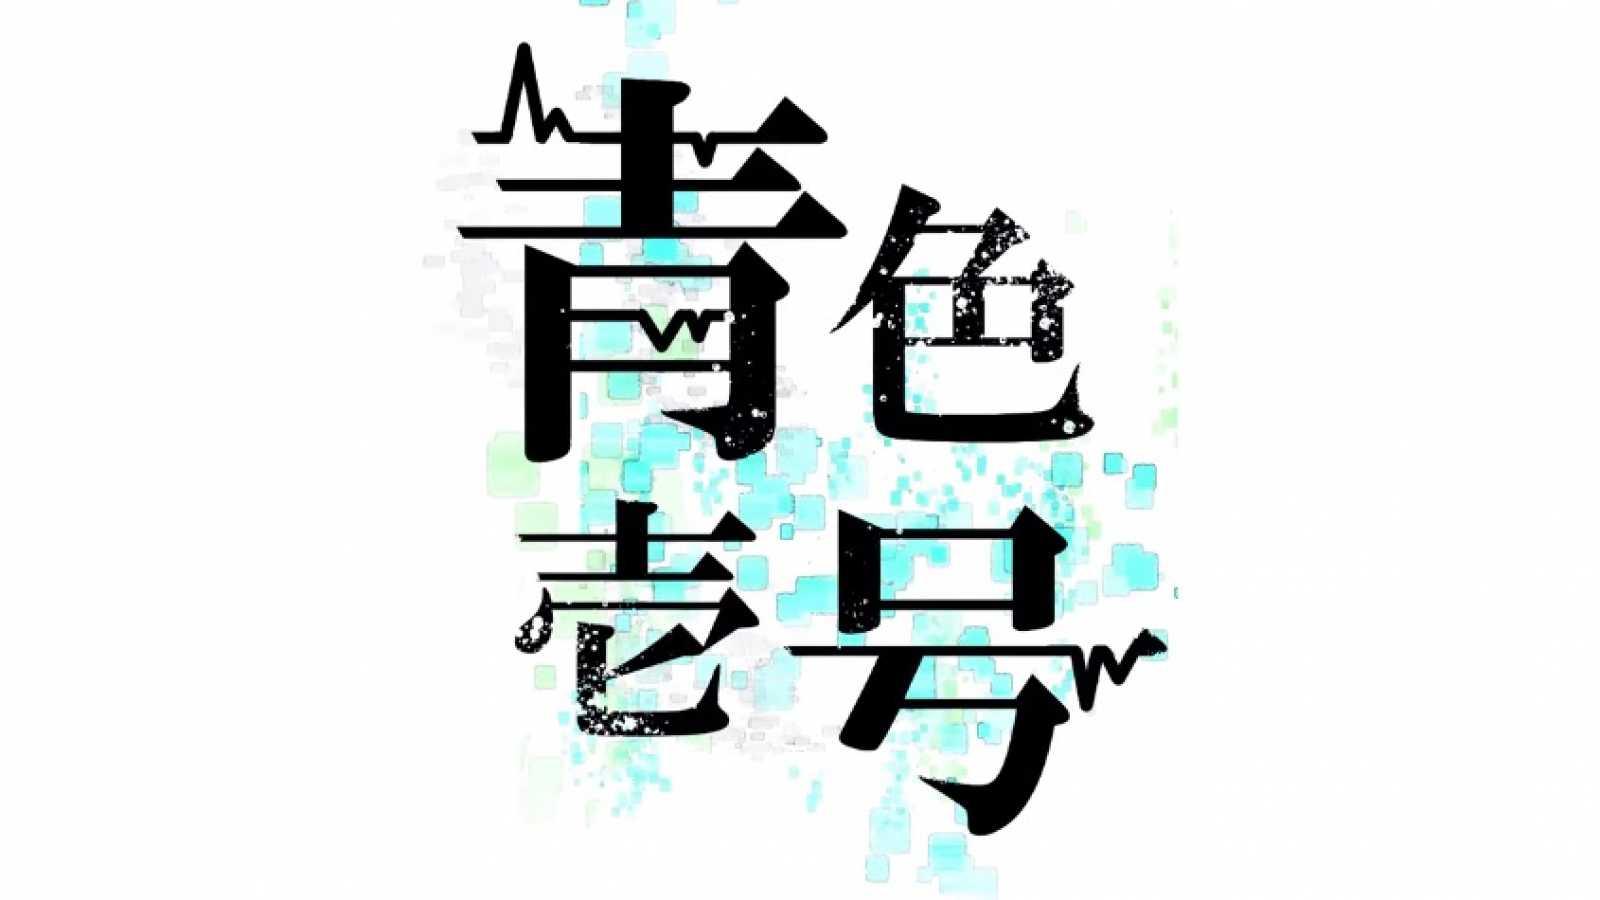 Aoiro-Ichigou © Aoiro-Ichigou. All rights reserved.